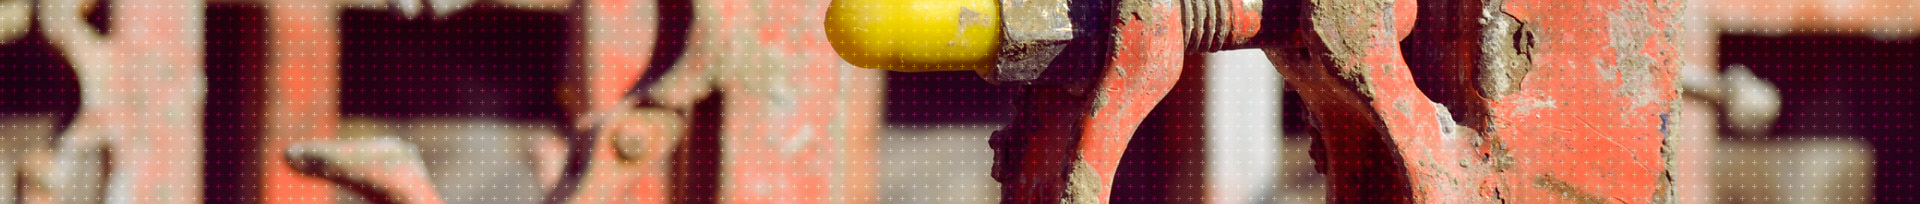 Slideshow Image 5